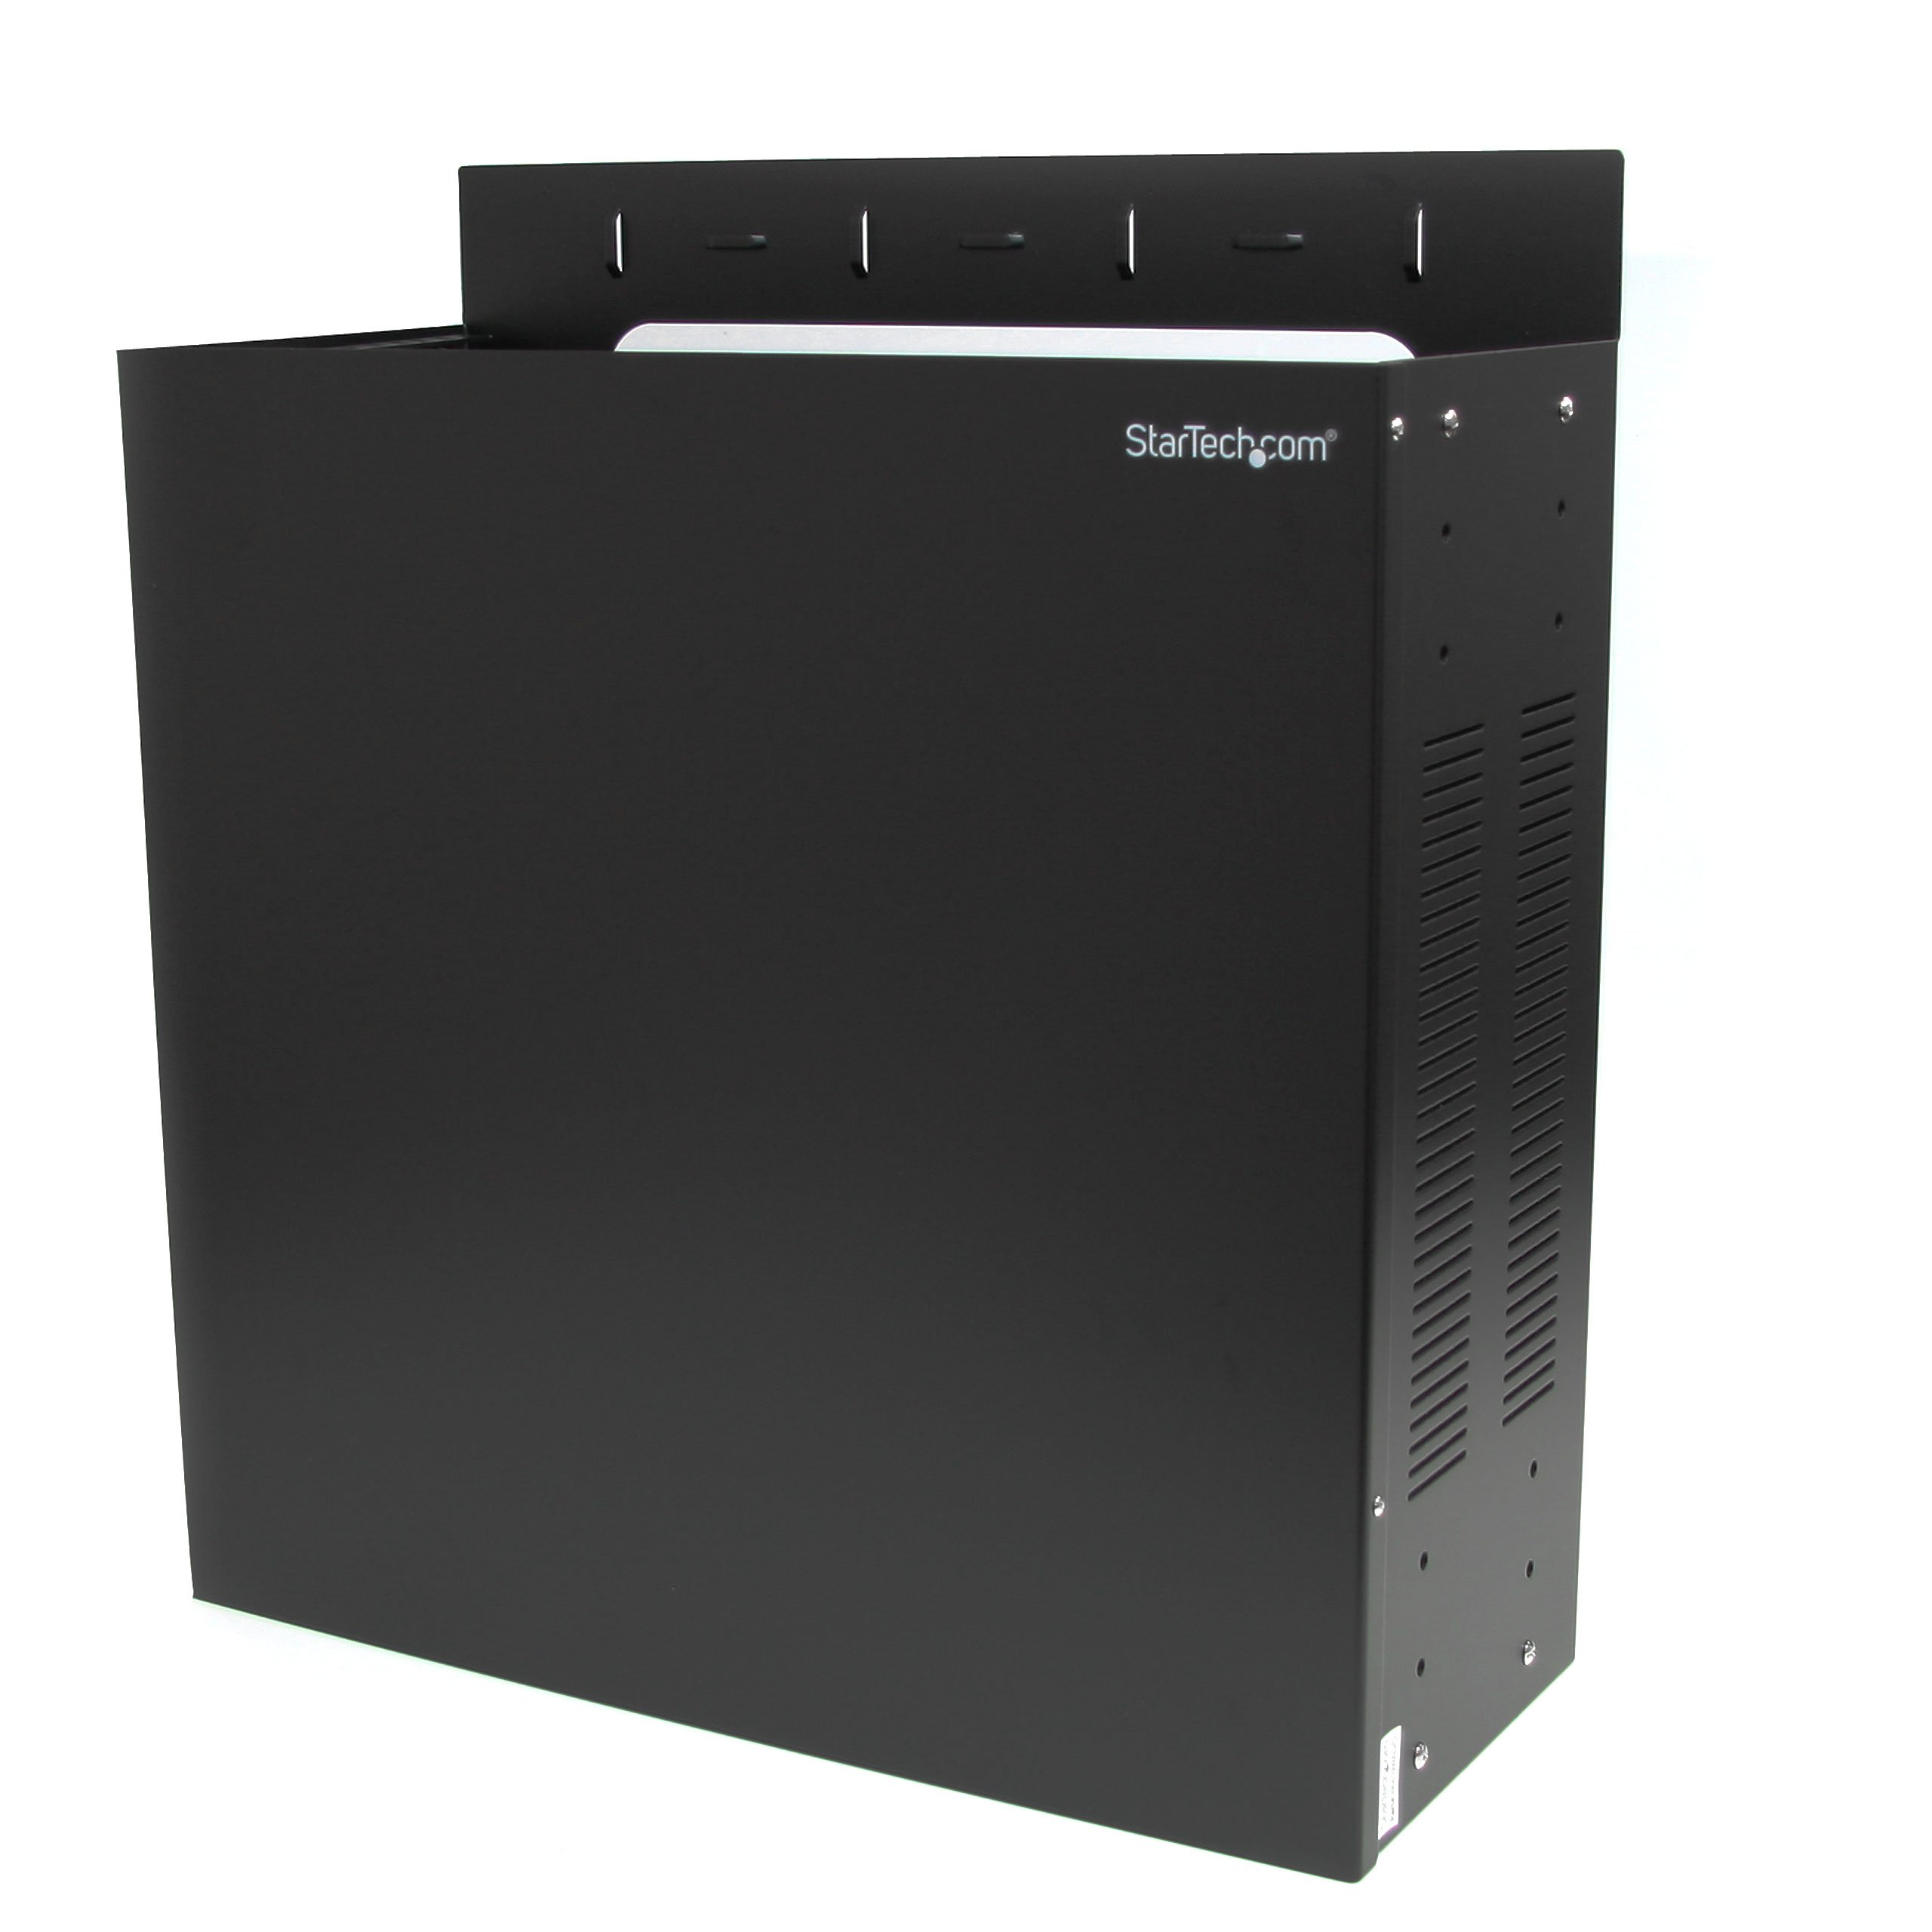 StarTech.com 4U 19-Inch Steel Horizontal Wall Mountable Server Rack RK419WALVO (Black)